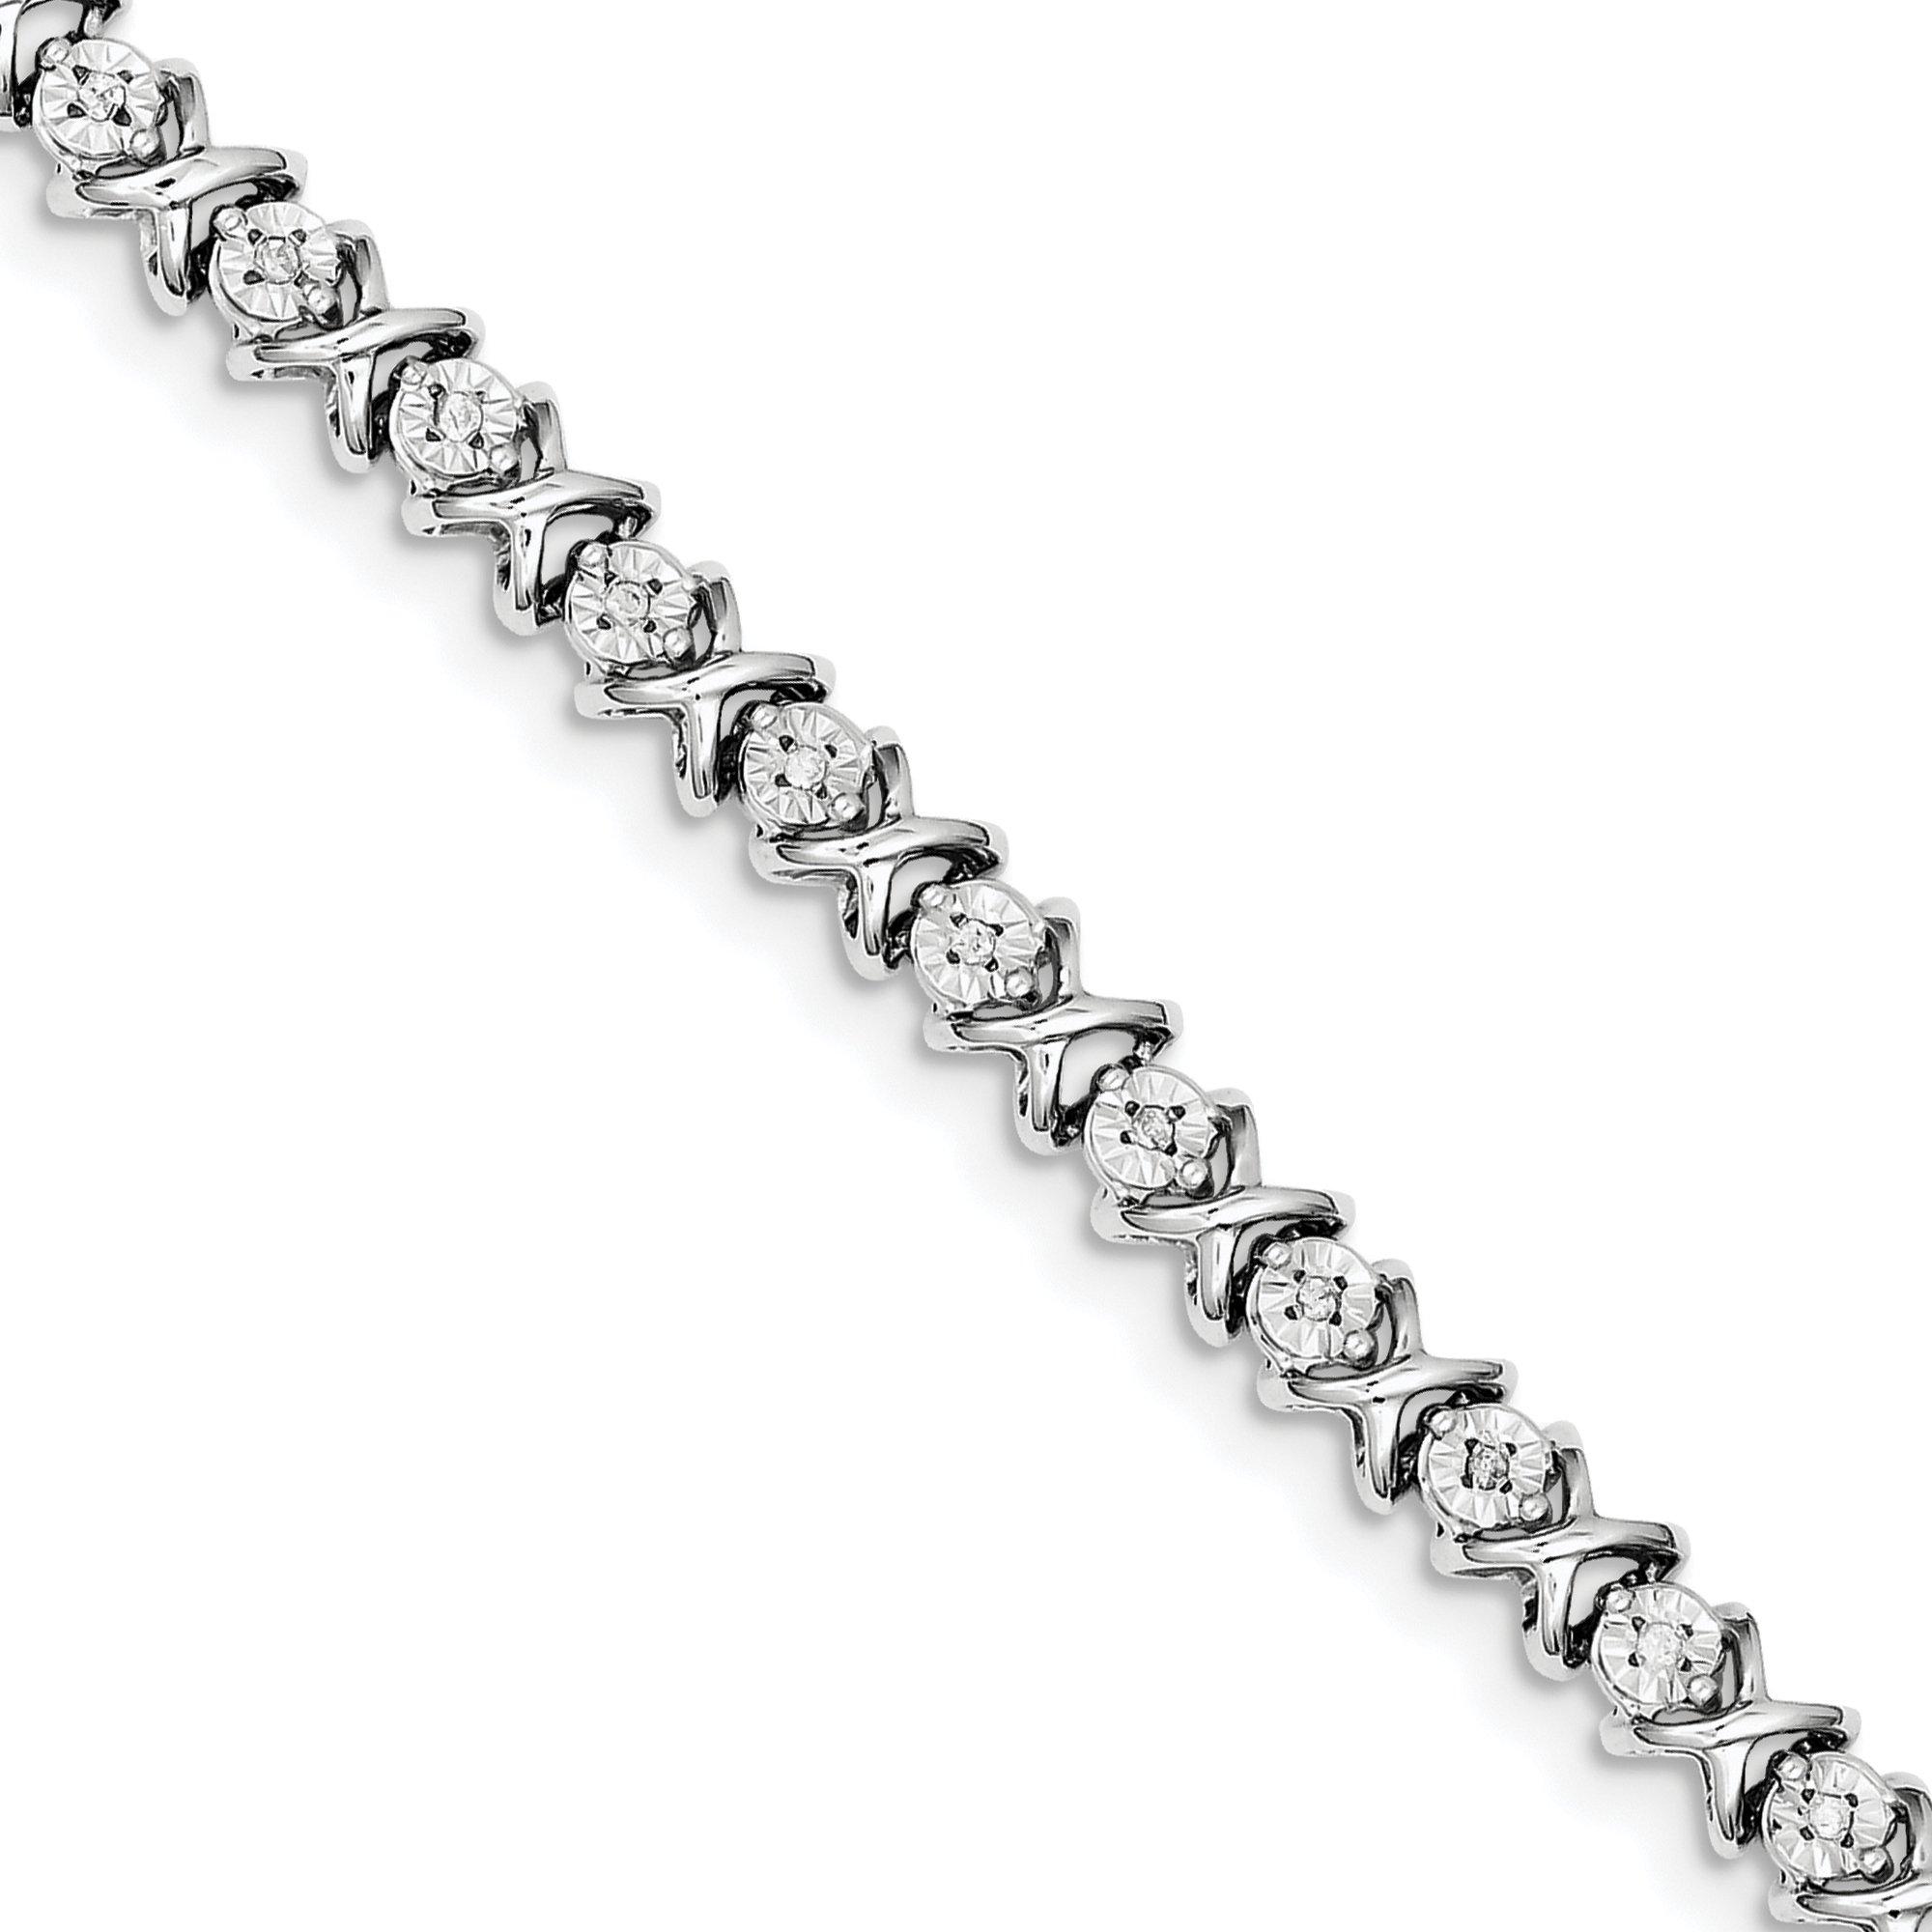 ICE CARATS 925 Sterling Silver Diamond X Bracelet 7 Inch Tennis Add-a- Hug Kiss Qd Fine Jewelry Gift Set For Women Heart